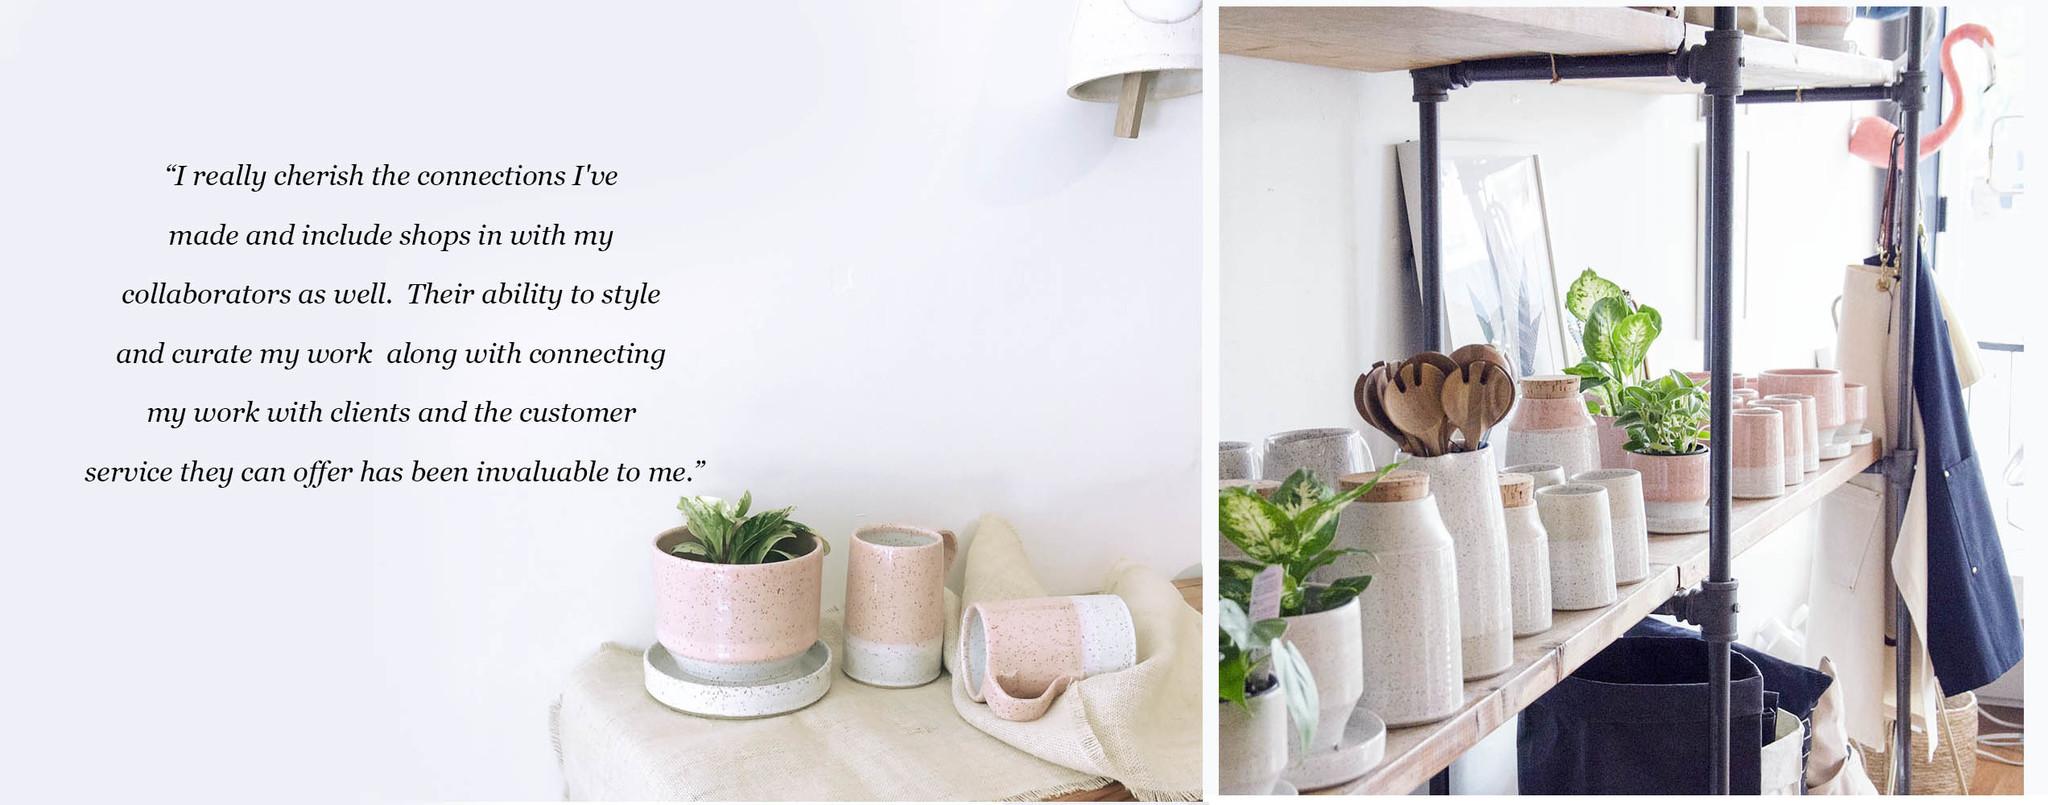 Dahlhaus Ceramics - Gifts for moms